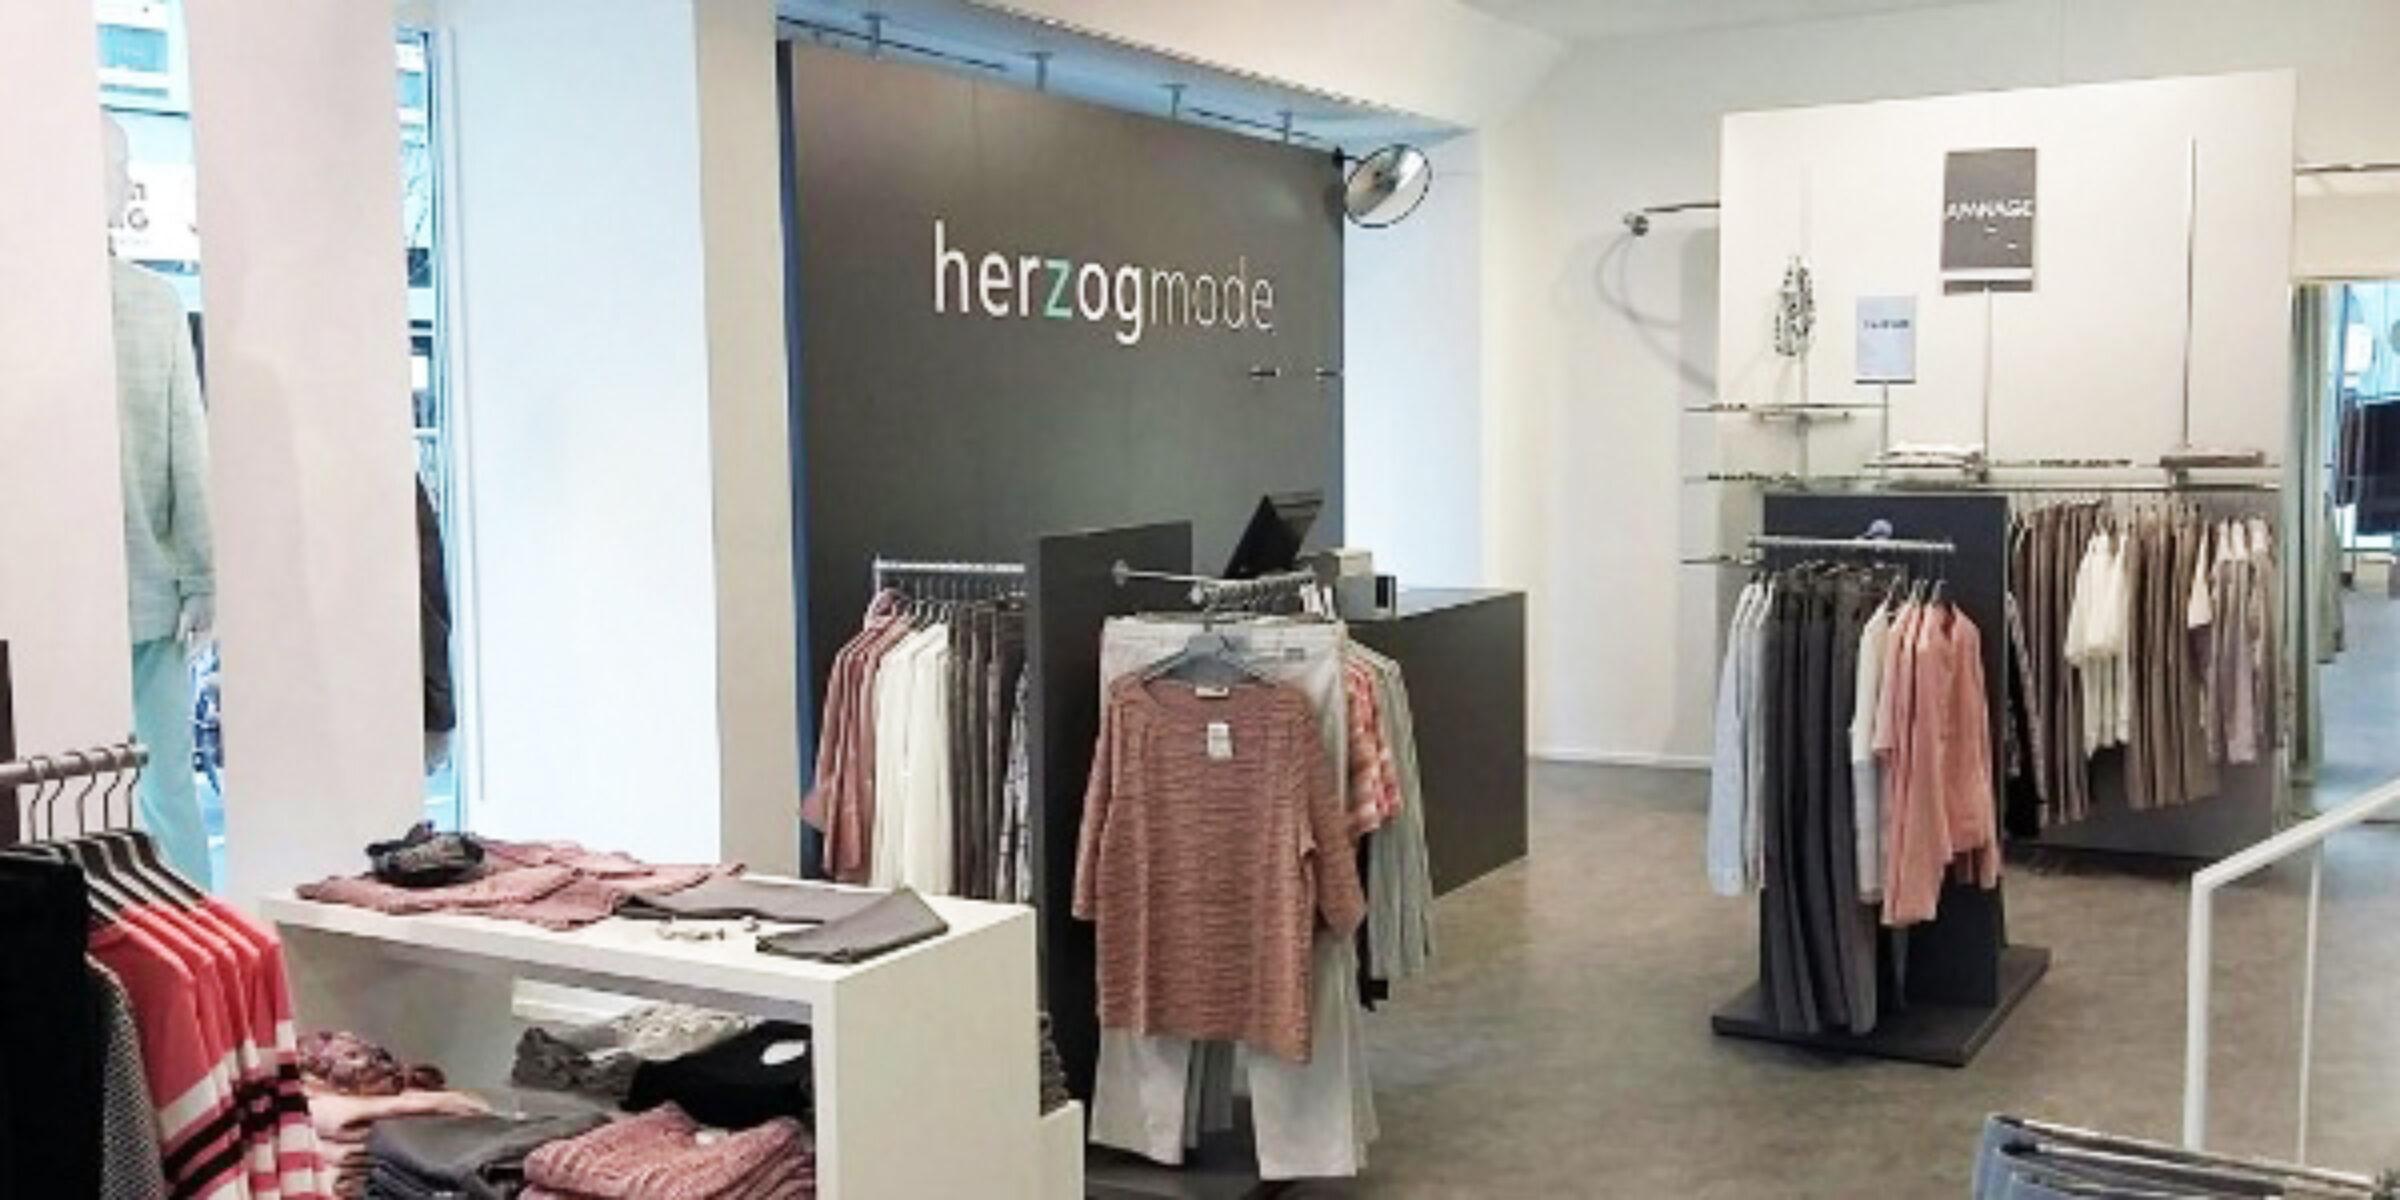 Herzog mode schwyz